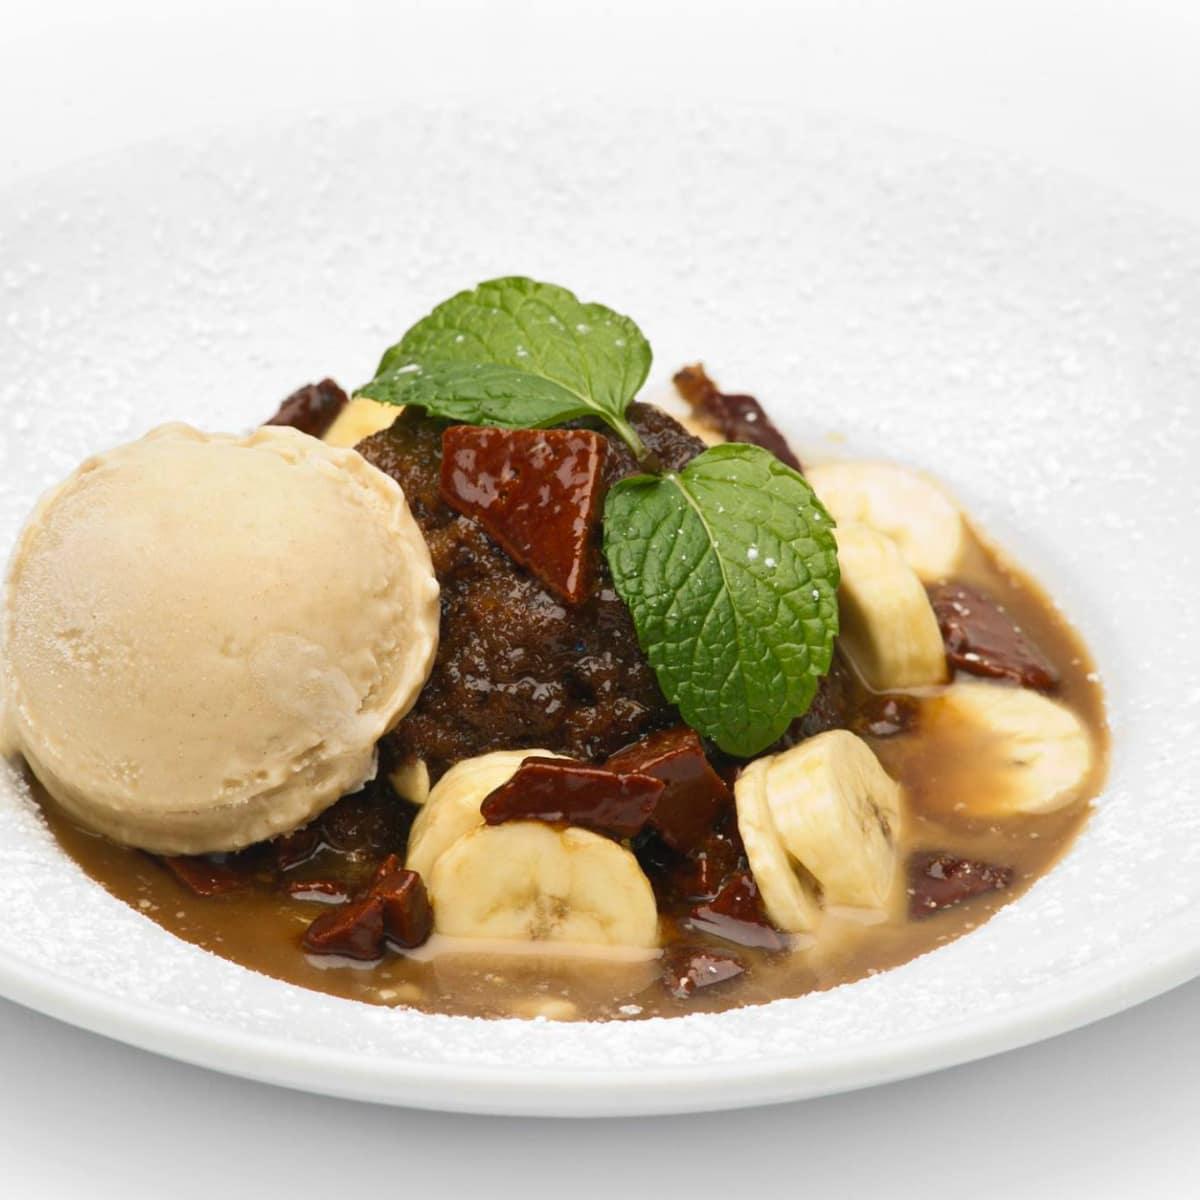 Paesanos toffee banana bread pudding dessert 2015